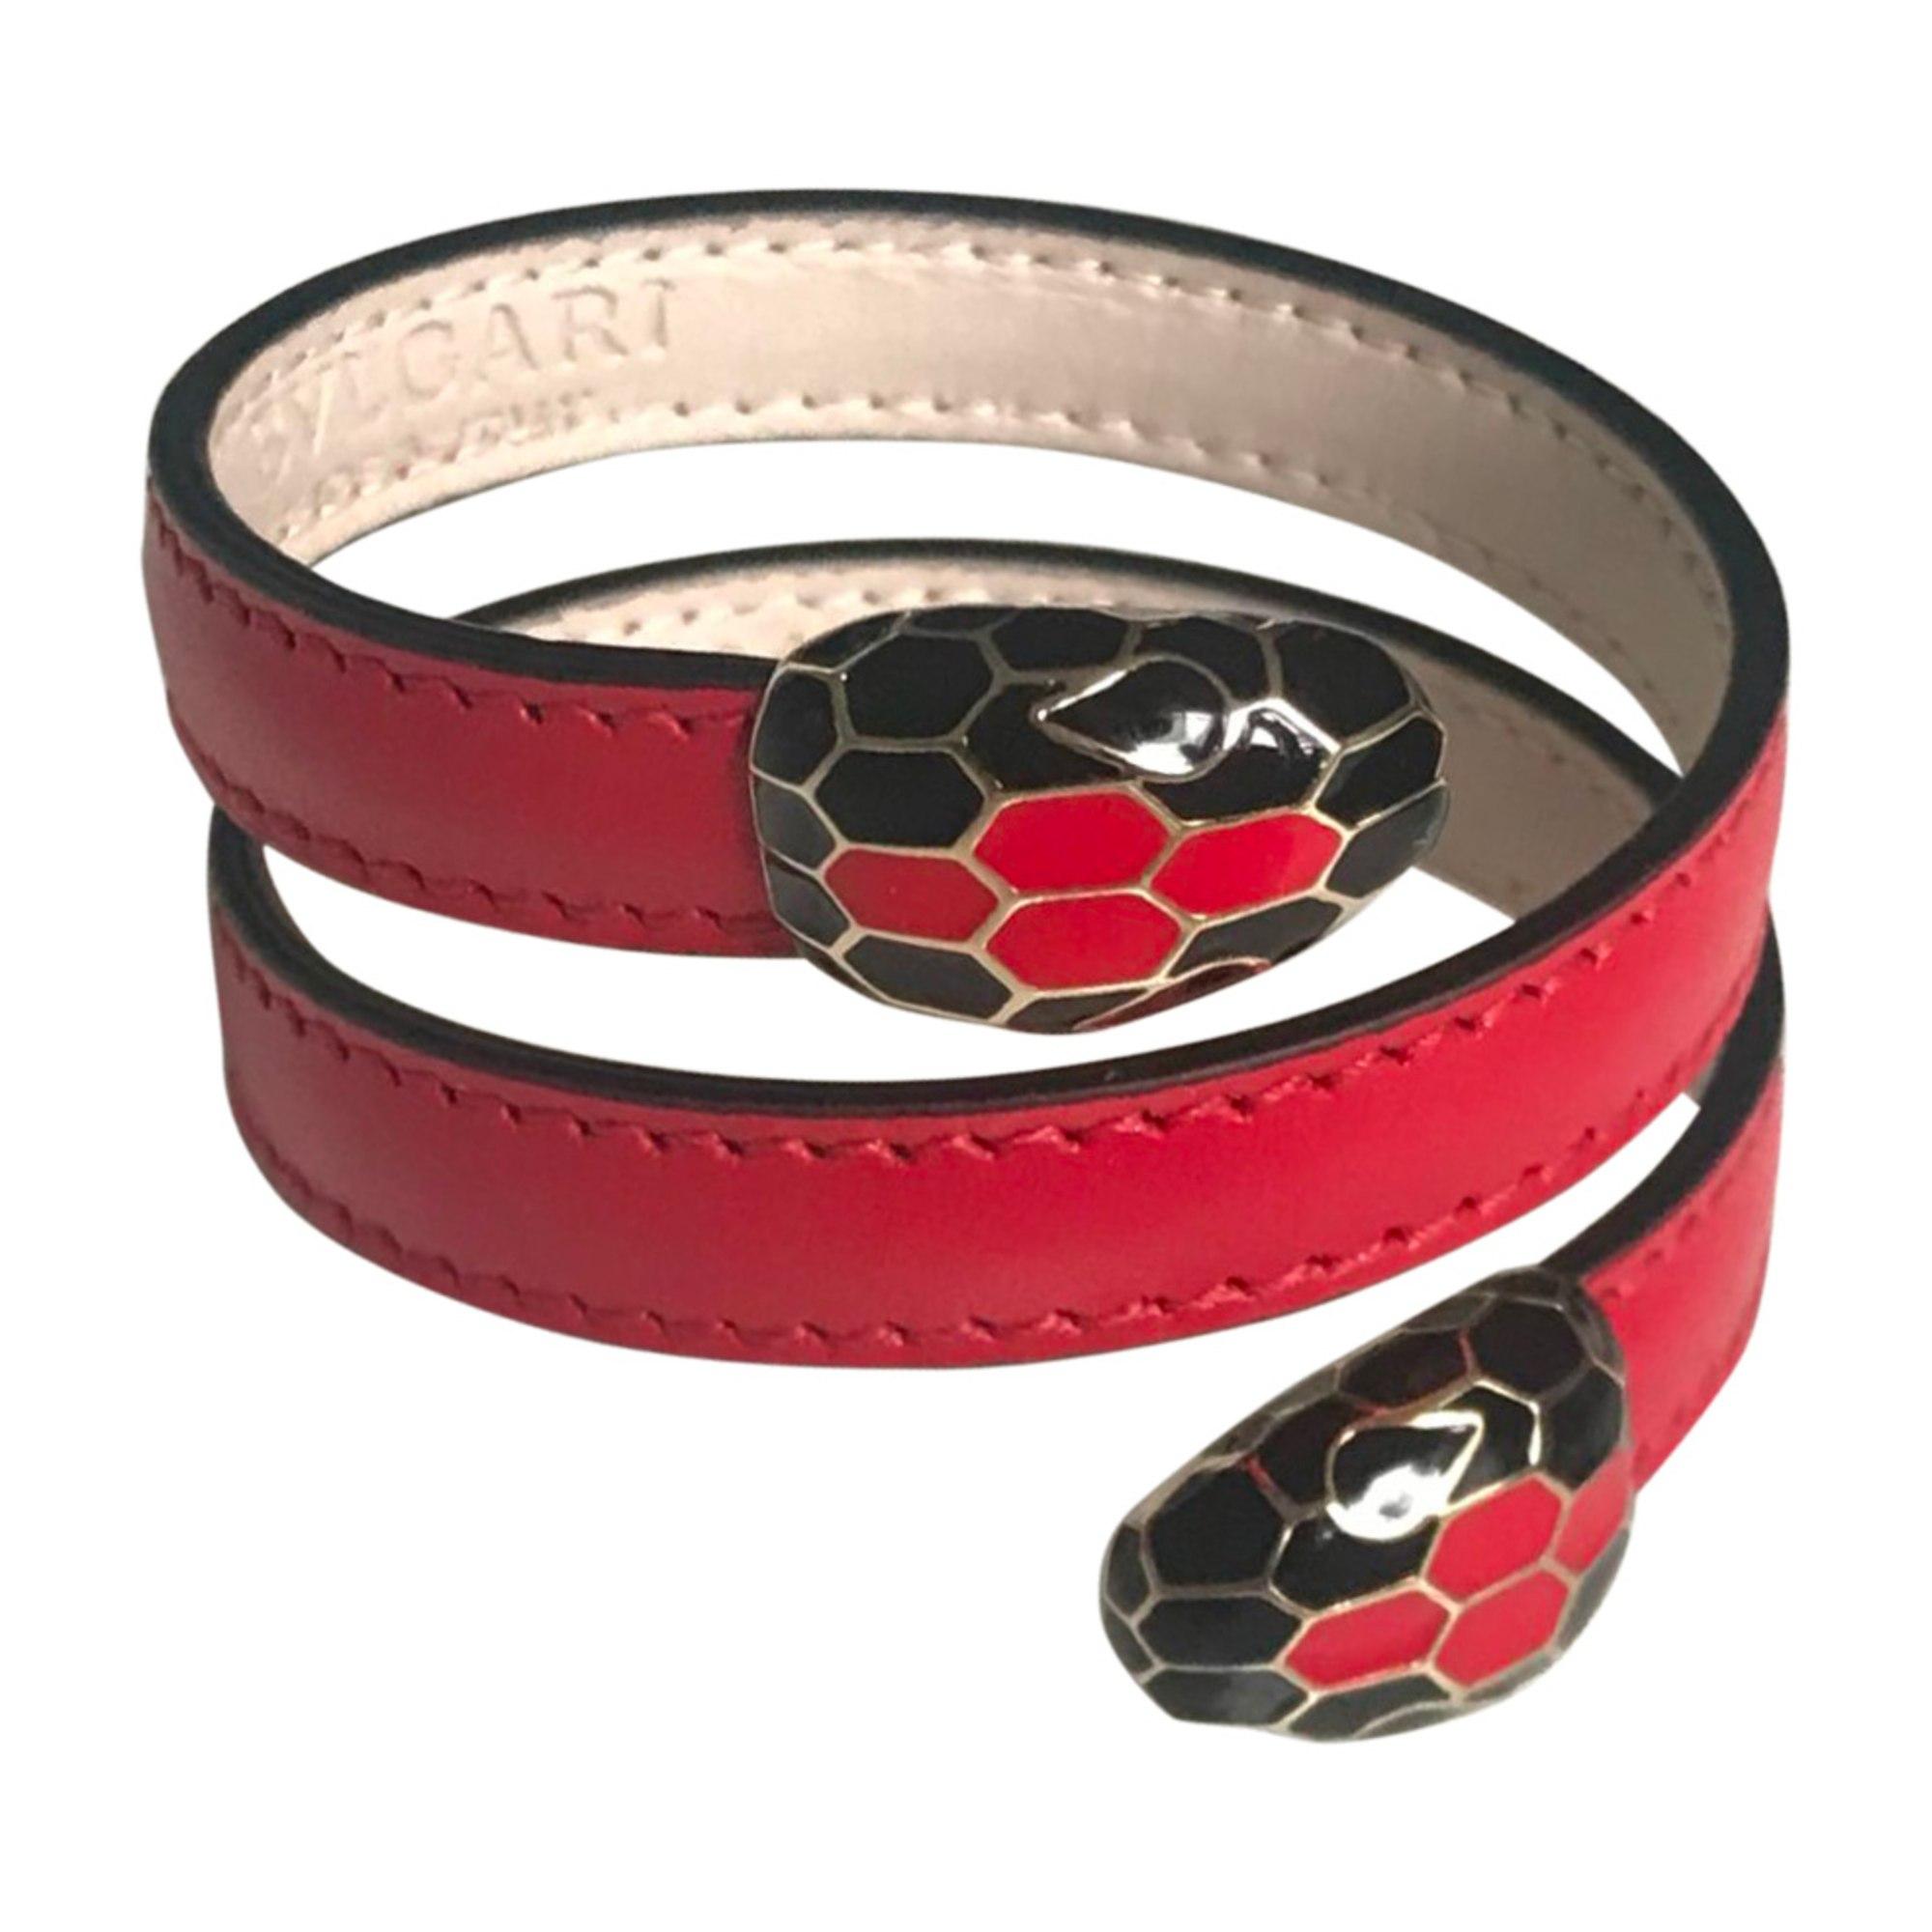 Bracelet BULGARI Red, burgundy